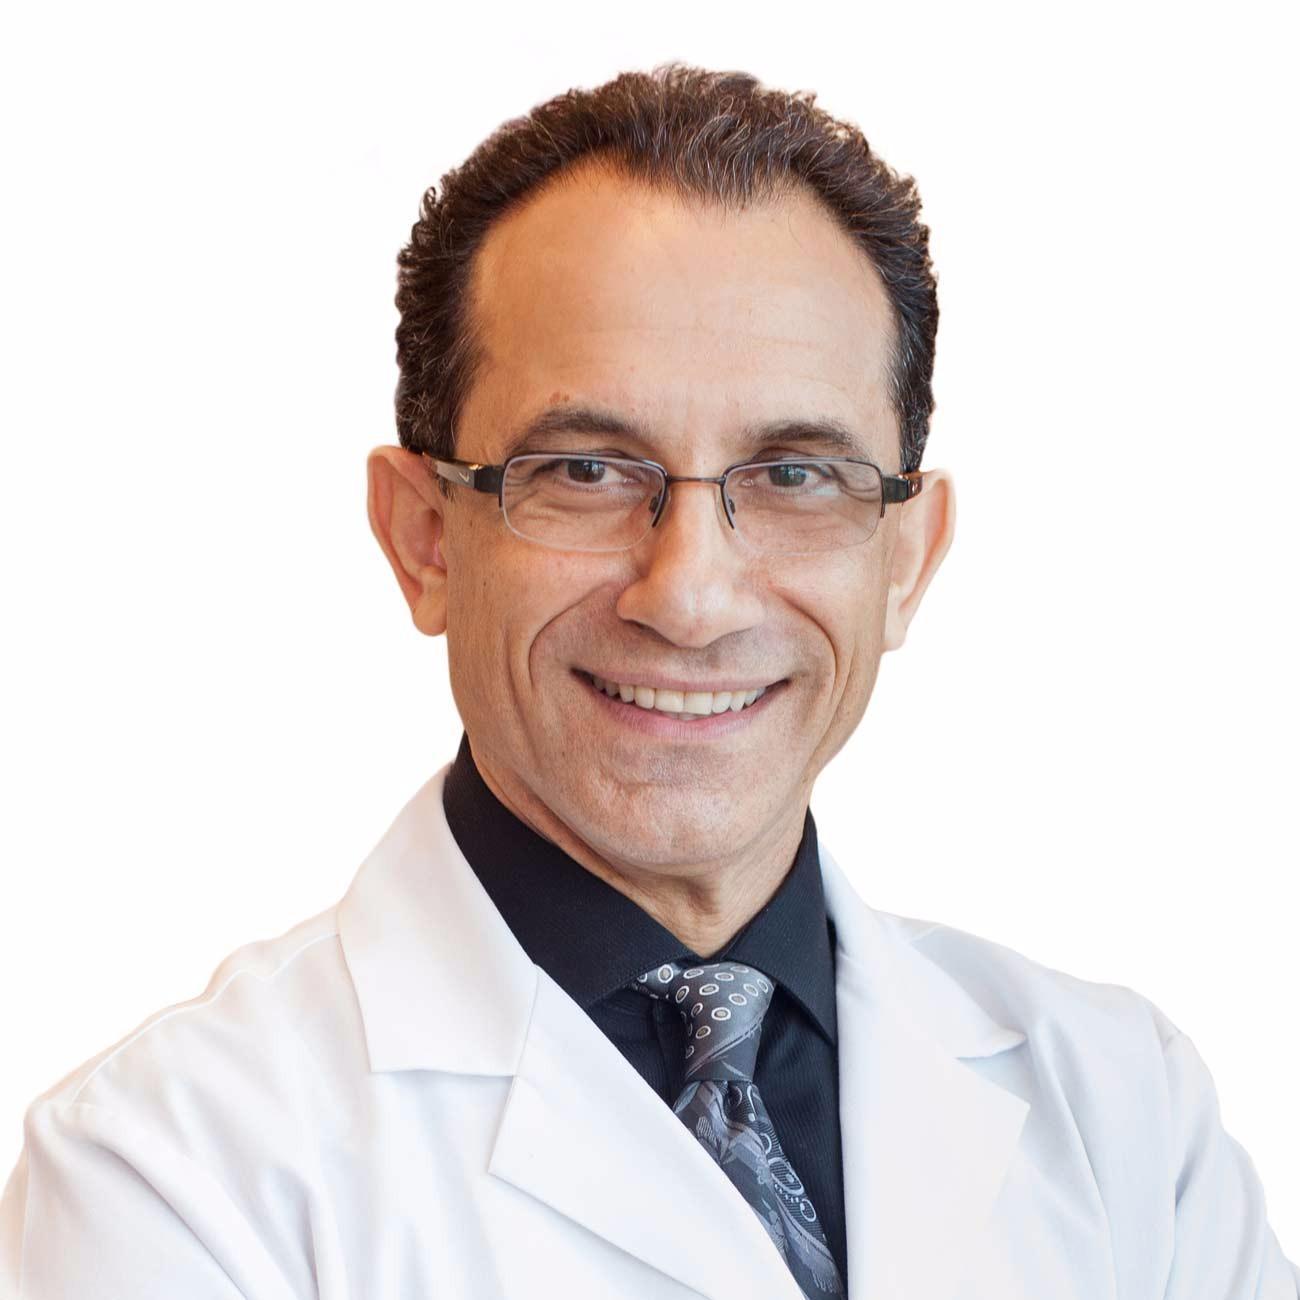 Fred Zargar, DDS - Tatum Dental Care